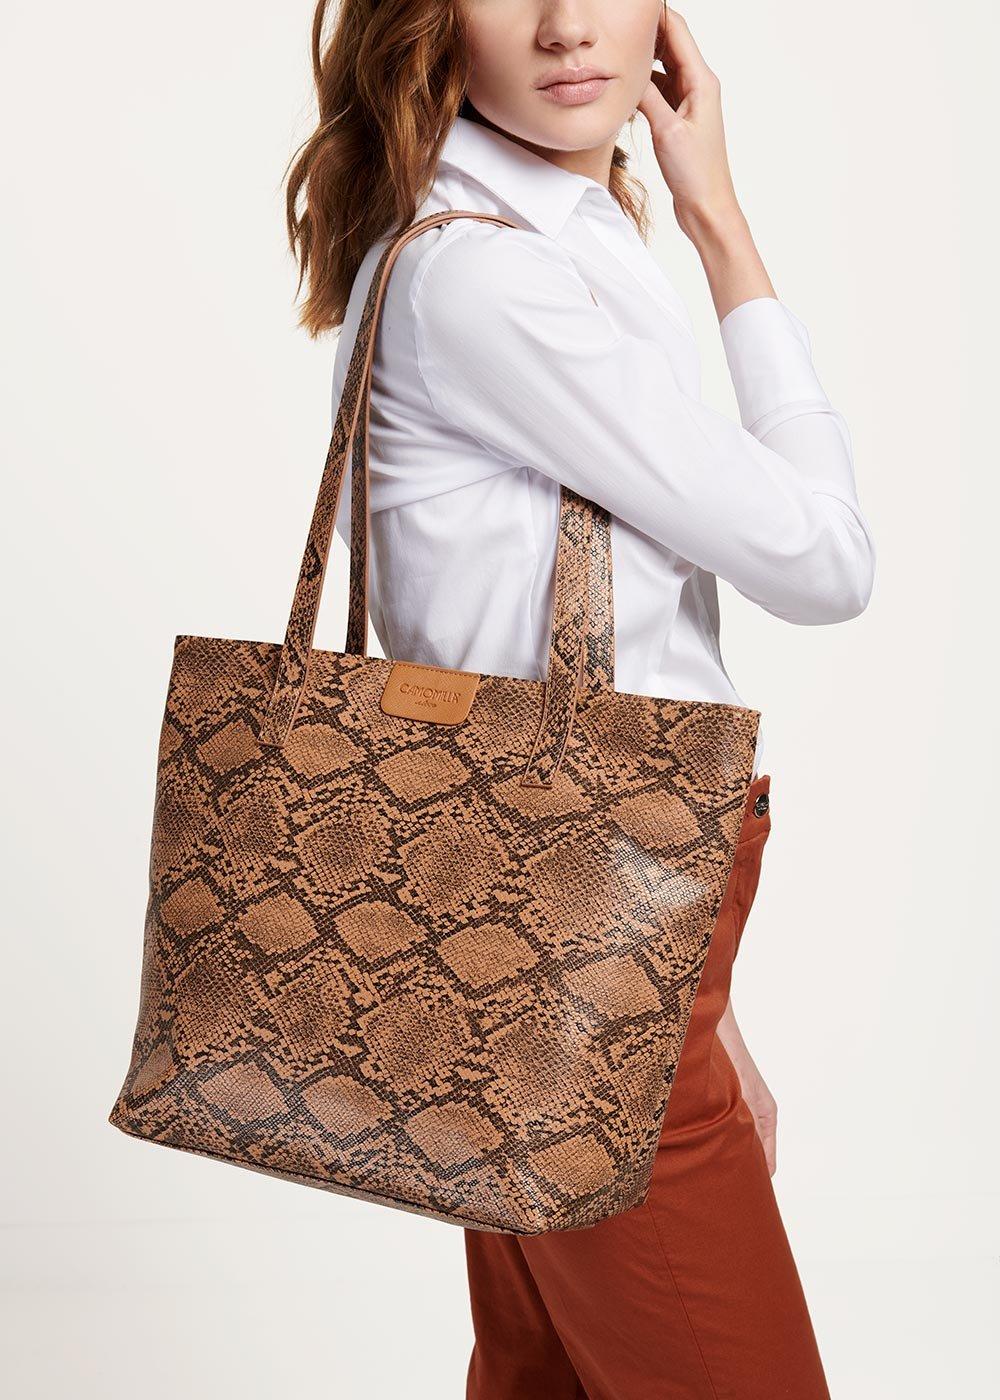 Badia shopping bag - Suolo Animalier - Woman